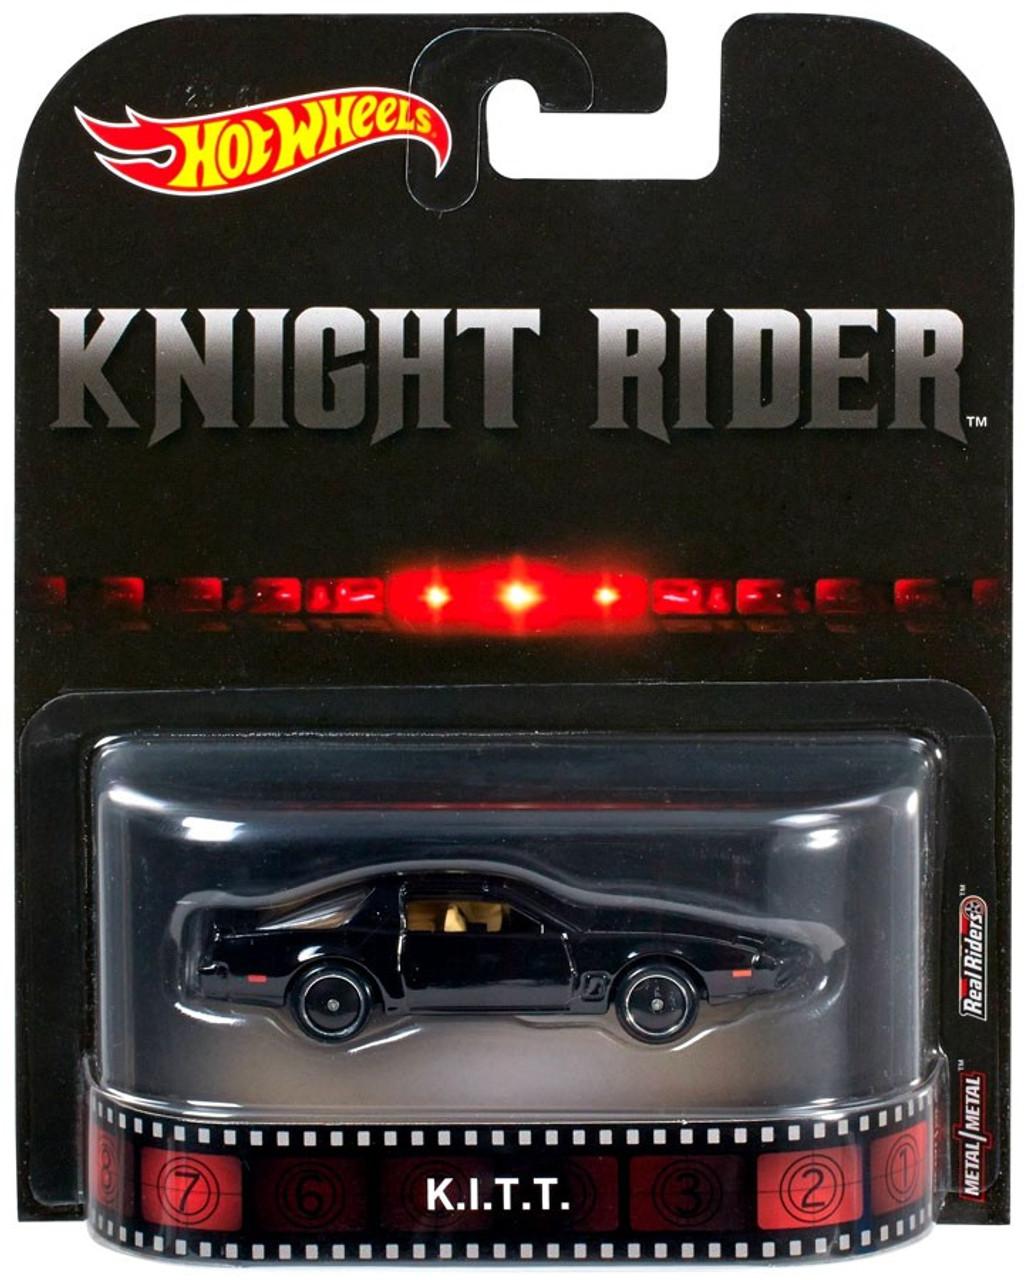 Hot Wheels Knight Rider HW Retro Entertainment K I T T  164